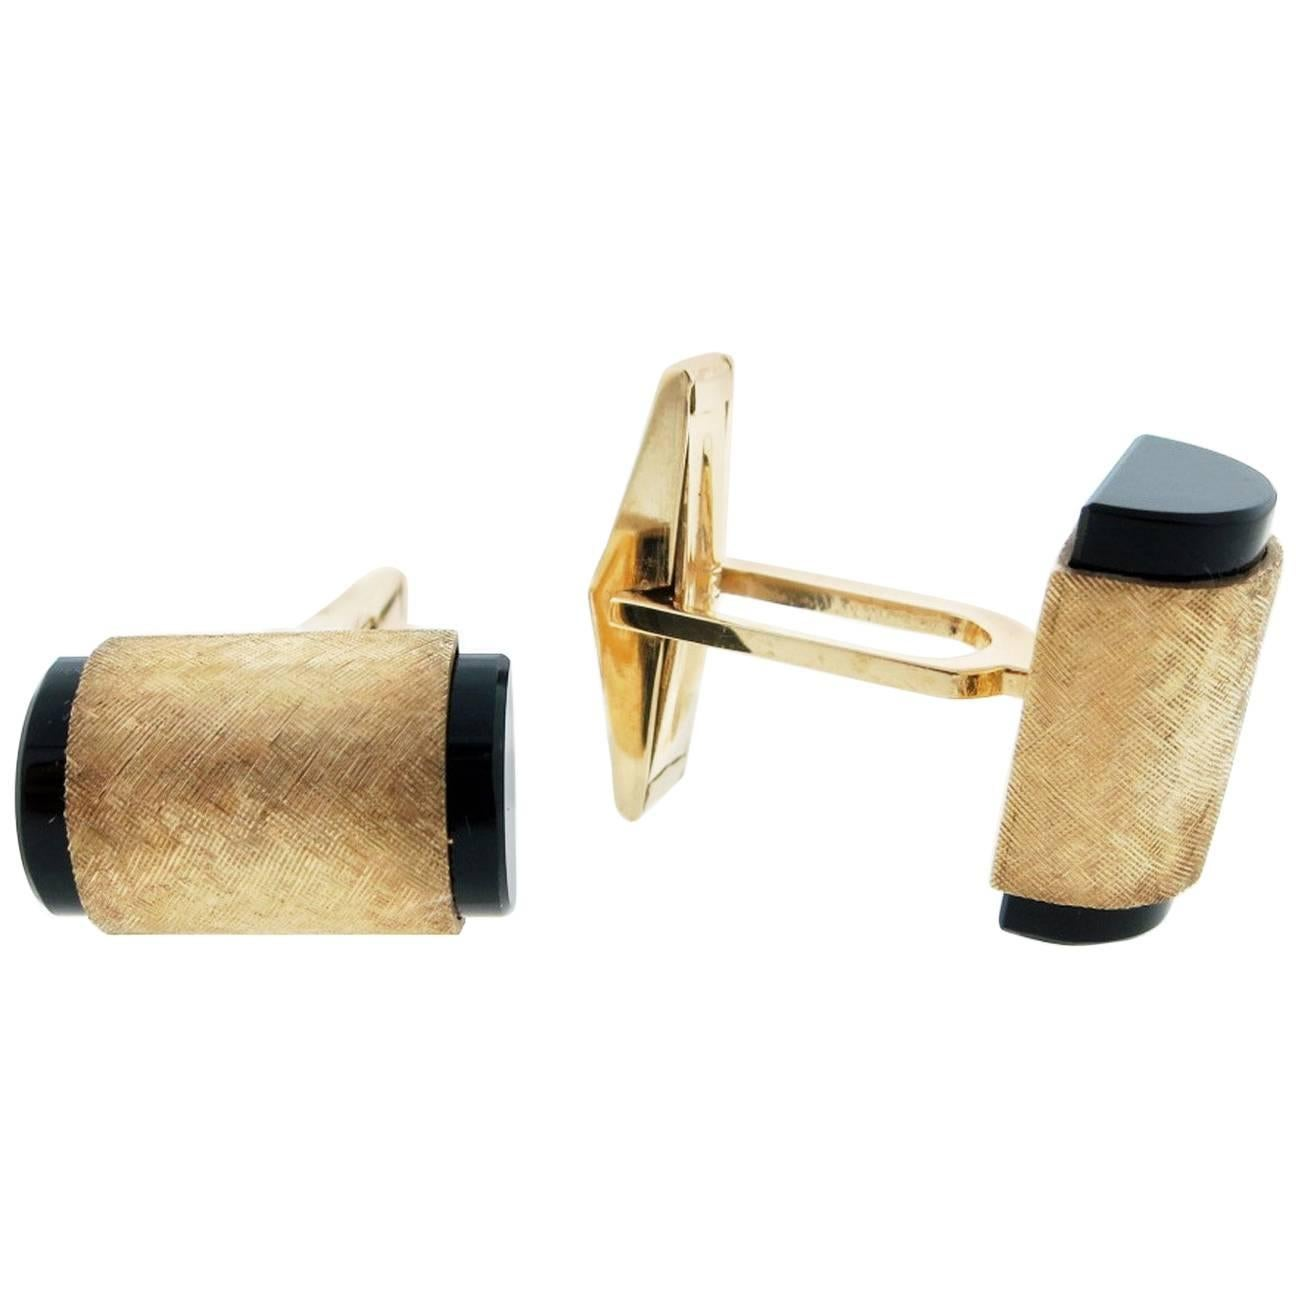 1stdibs 14k Yellow Gold With Onyx Chain-link Cuff Links 7W07UmGa